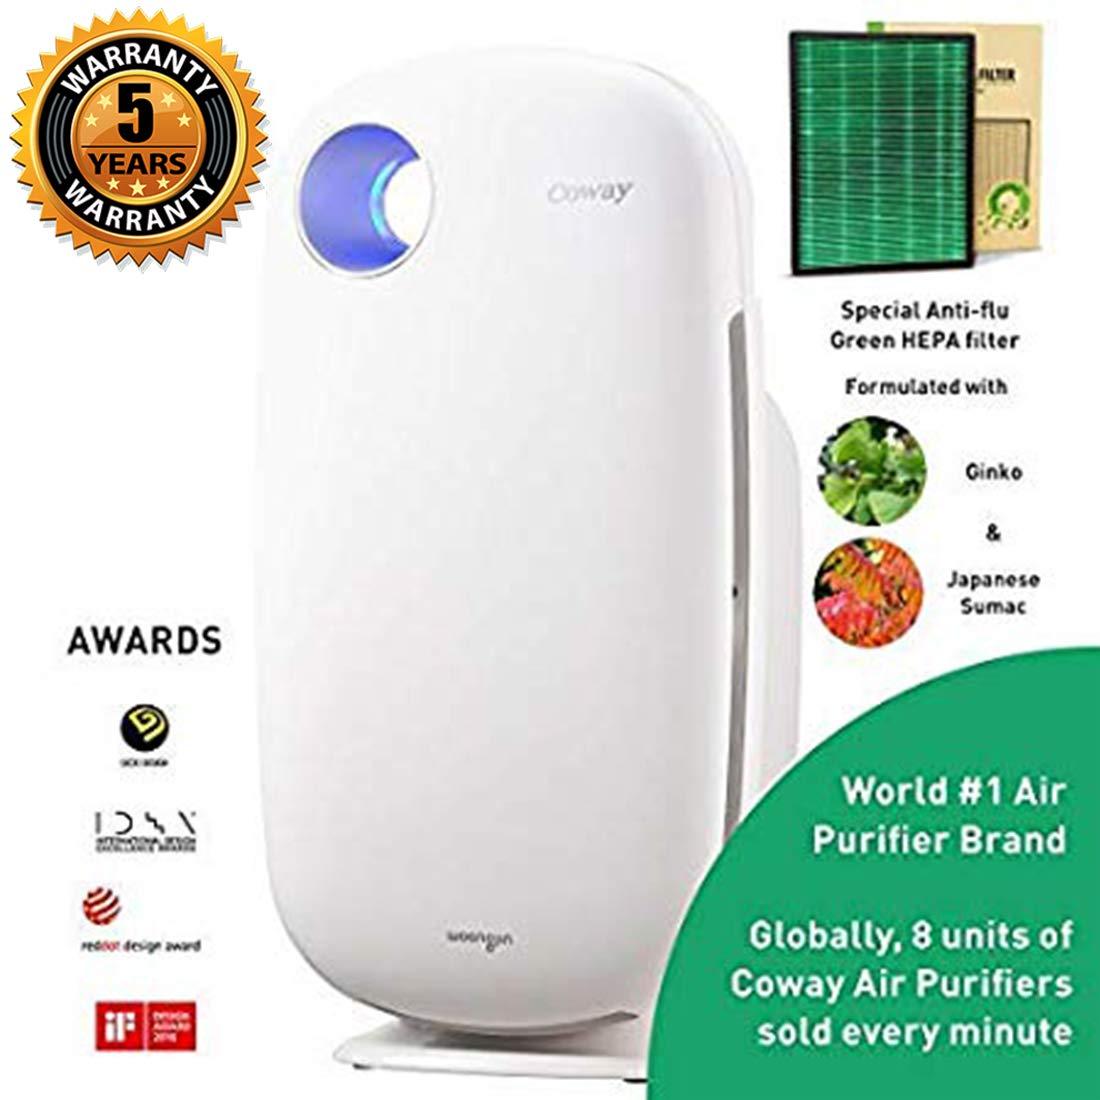 Coway Sleek Pro AP-1009 Air Purifier